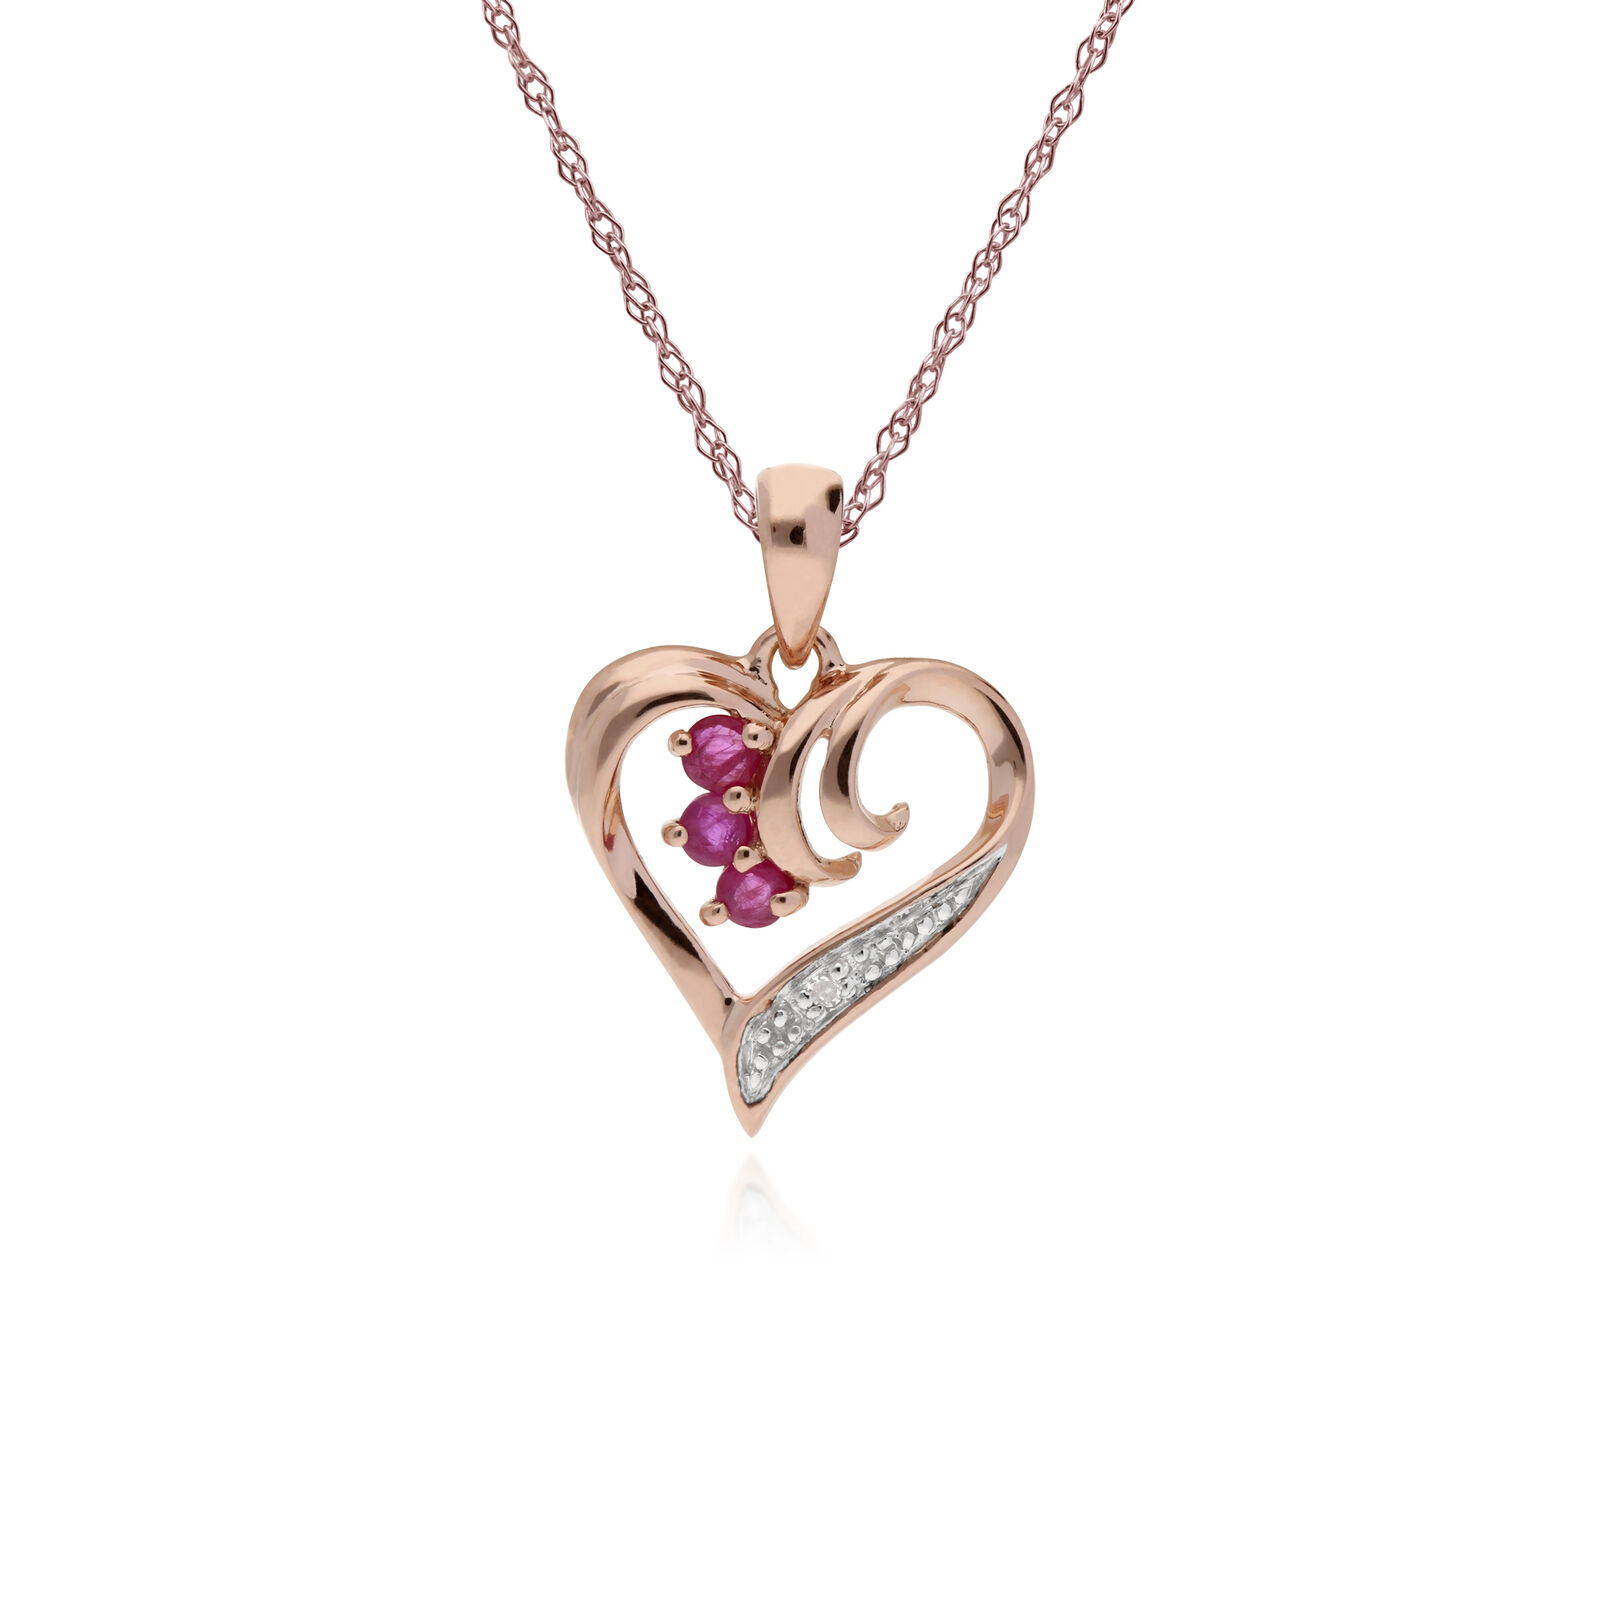 Gemondo 9ct pink gold 0.13ct Ruby & Diamond Heart Pendant on 45cm Chain